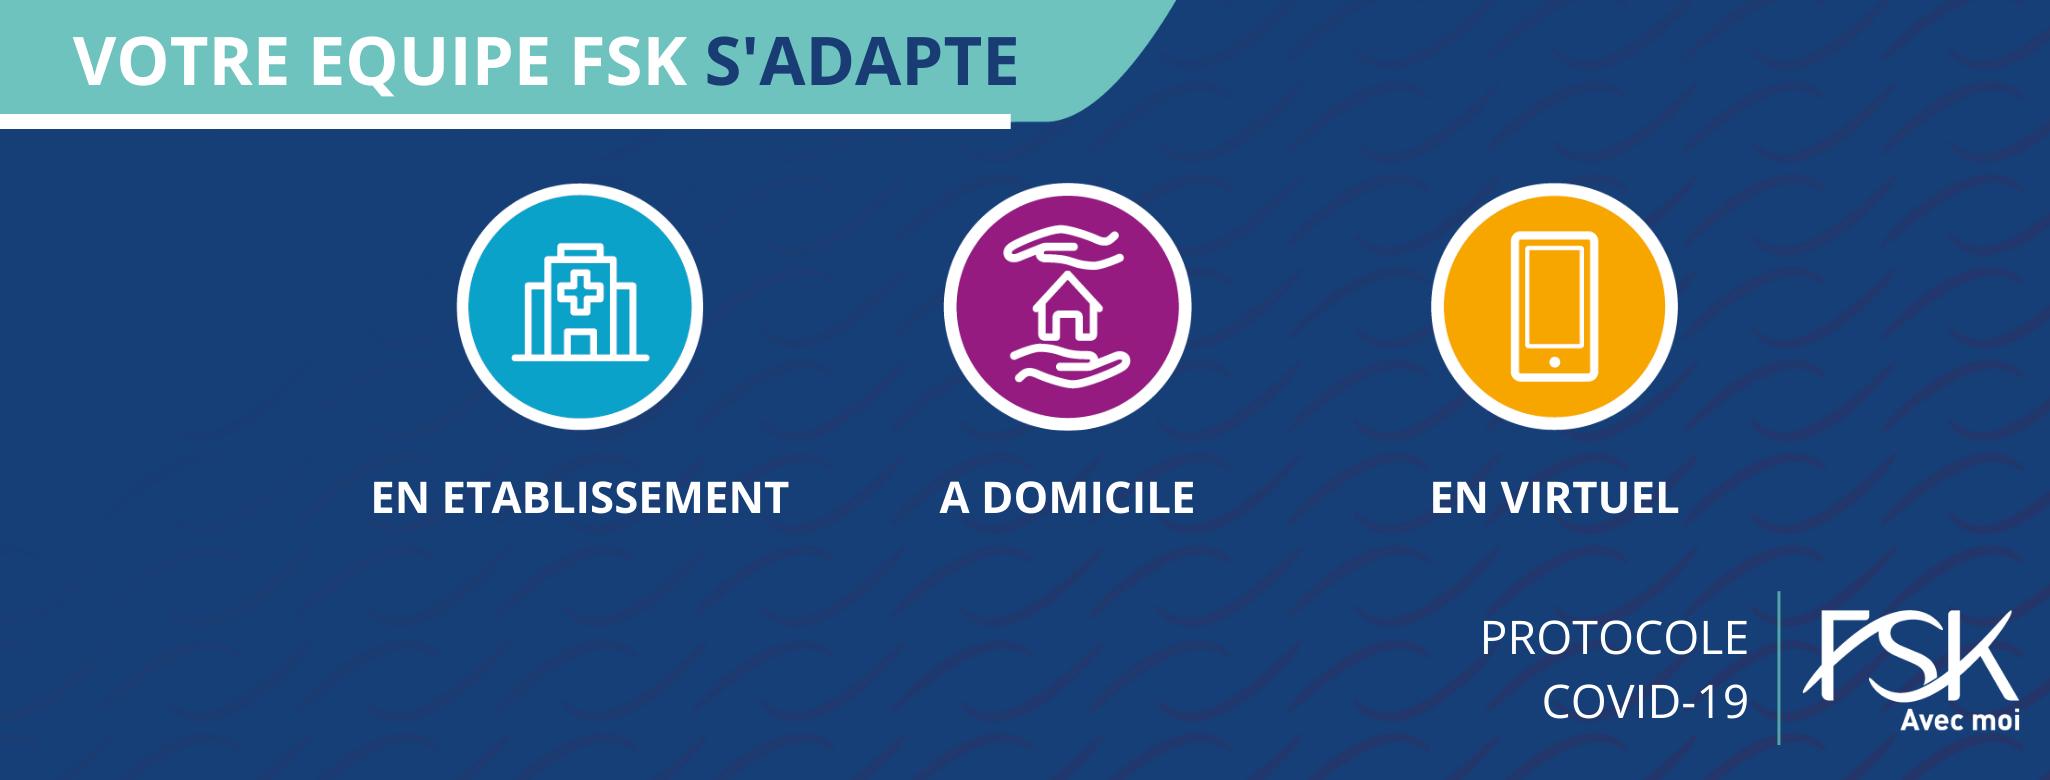 VOTRE_EQUIPE_FSK_SADAPTE_-_V2